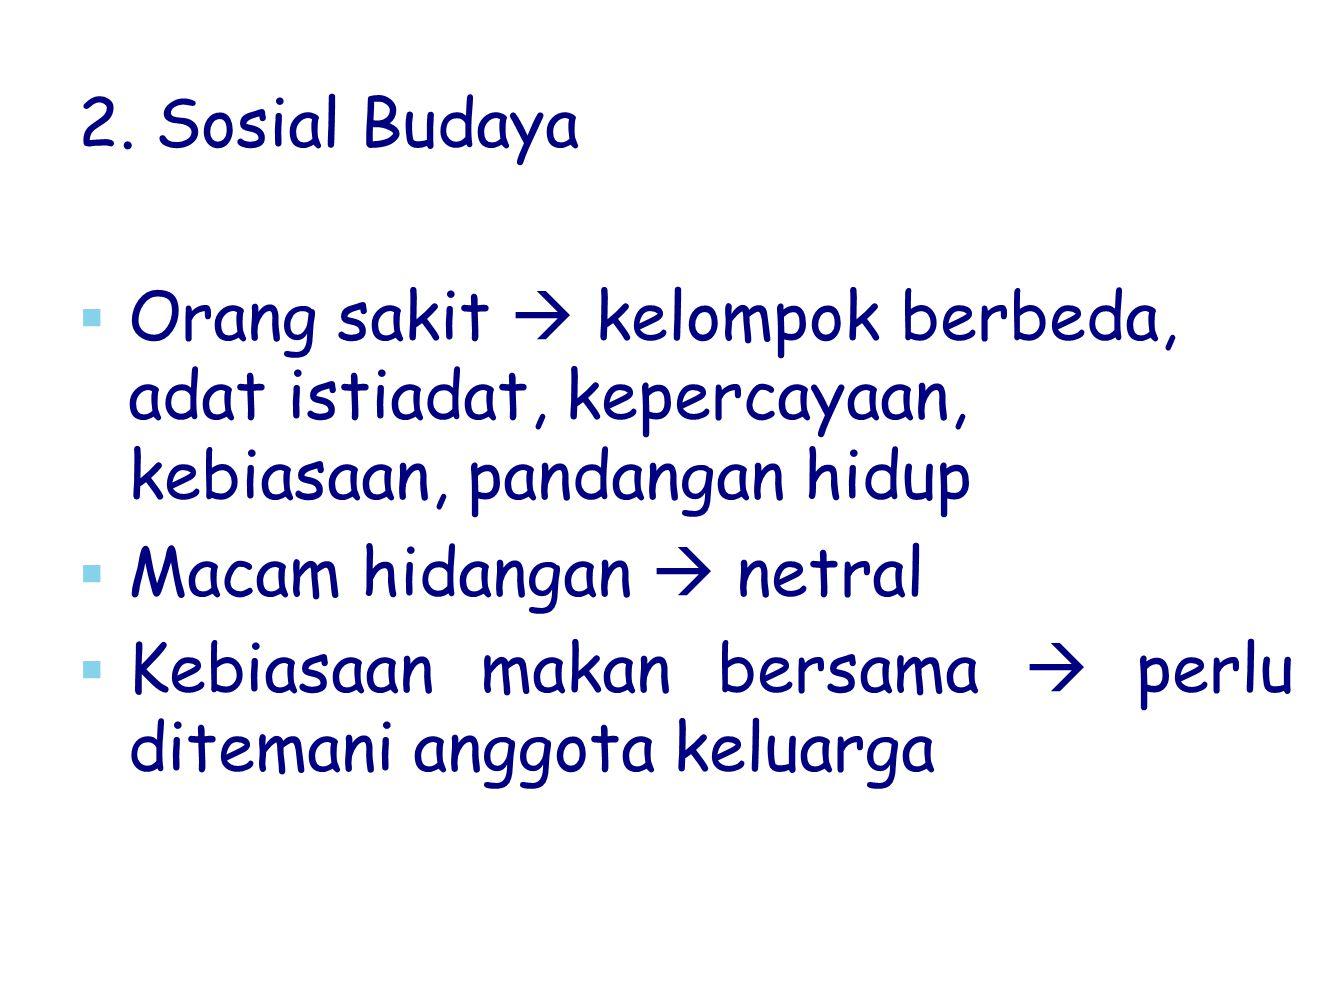 2. Sosial Budaya   Orang sakit  kelompok berbeda, adat istiadat, kepercayaan, kebiasaan, pandangan hidup   Macam hidangan  netral   Kebiasaan